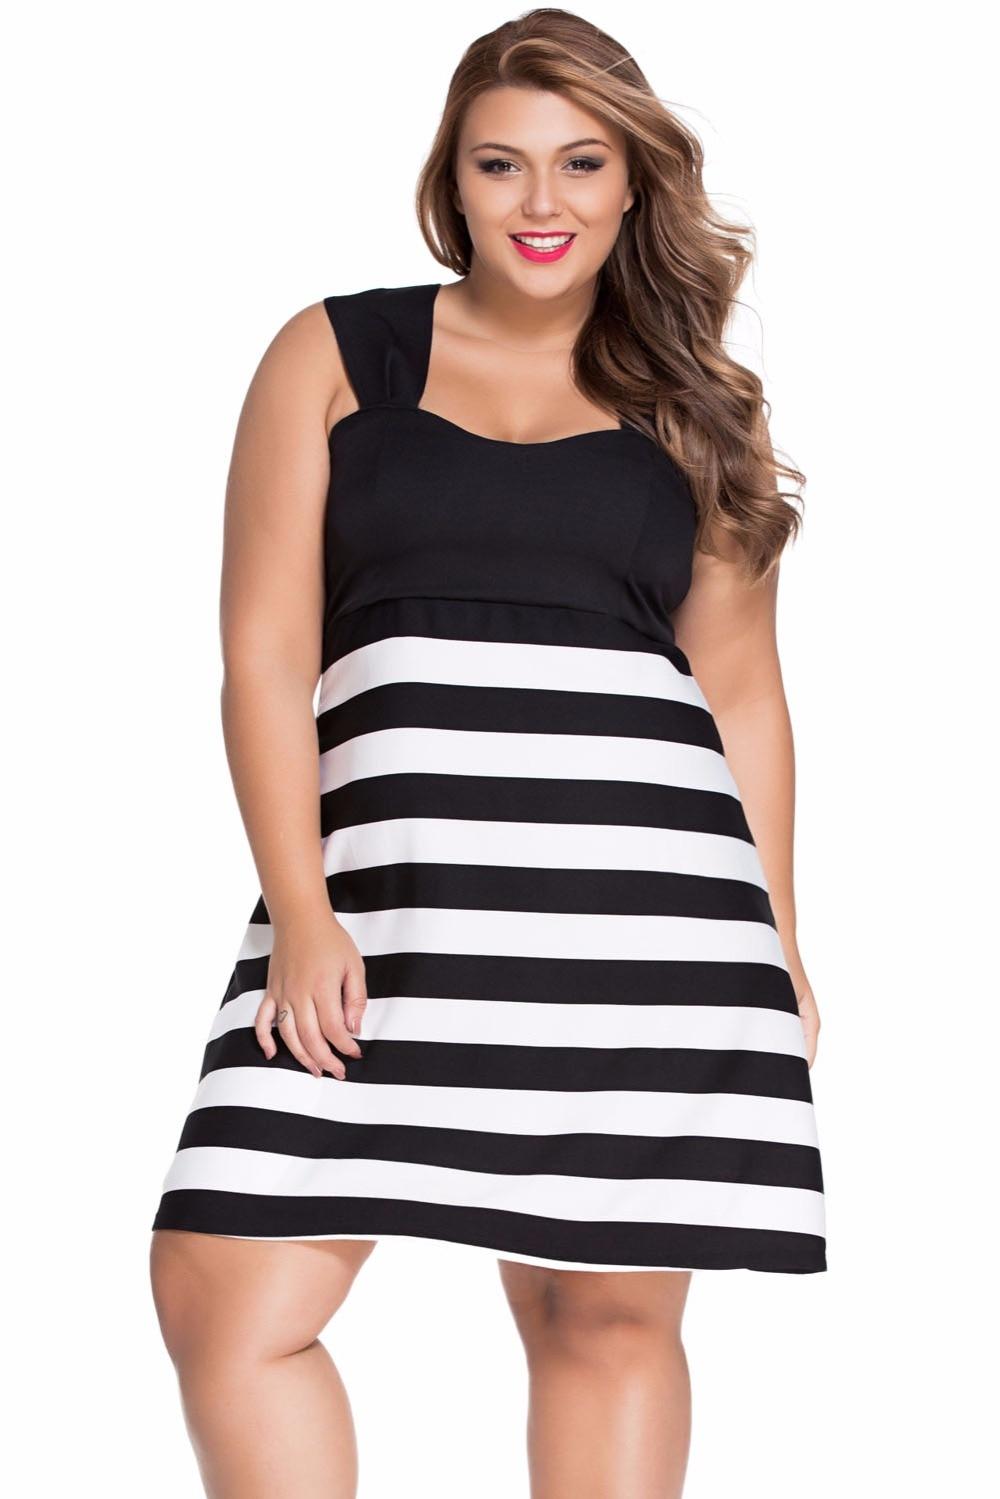 XL XXXL Black And White Plus Size Block Stripe Big Girl ...